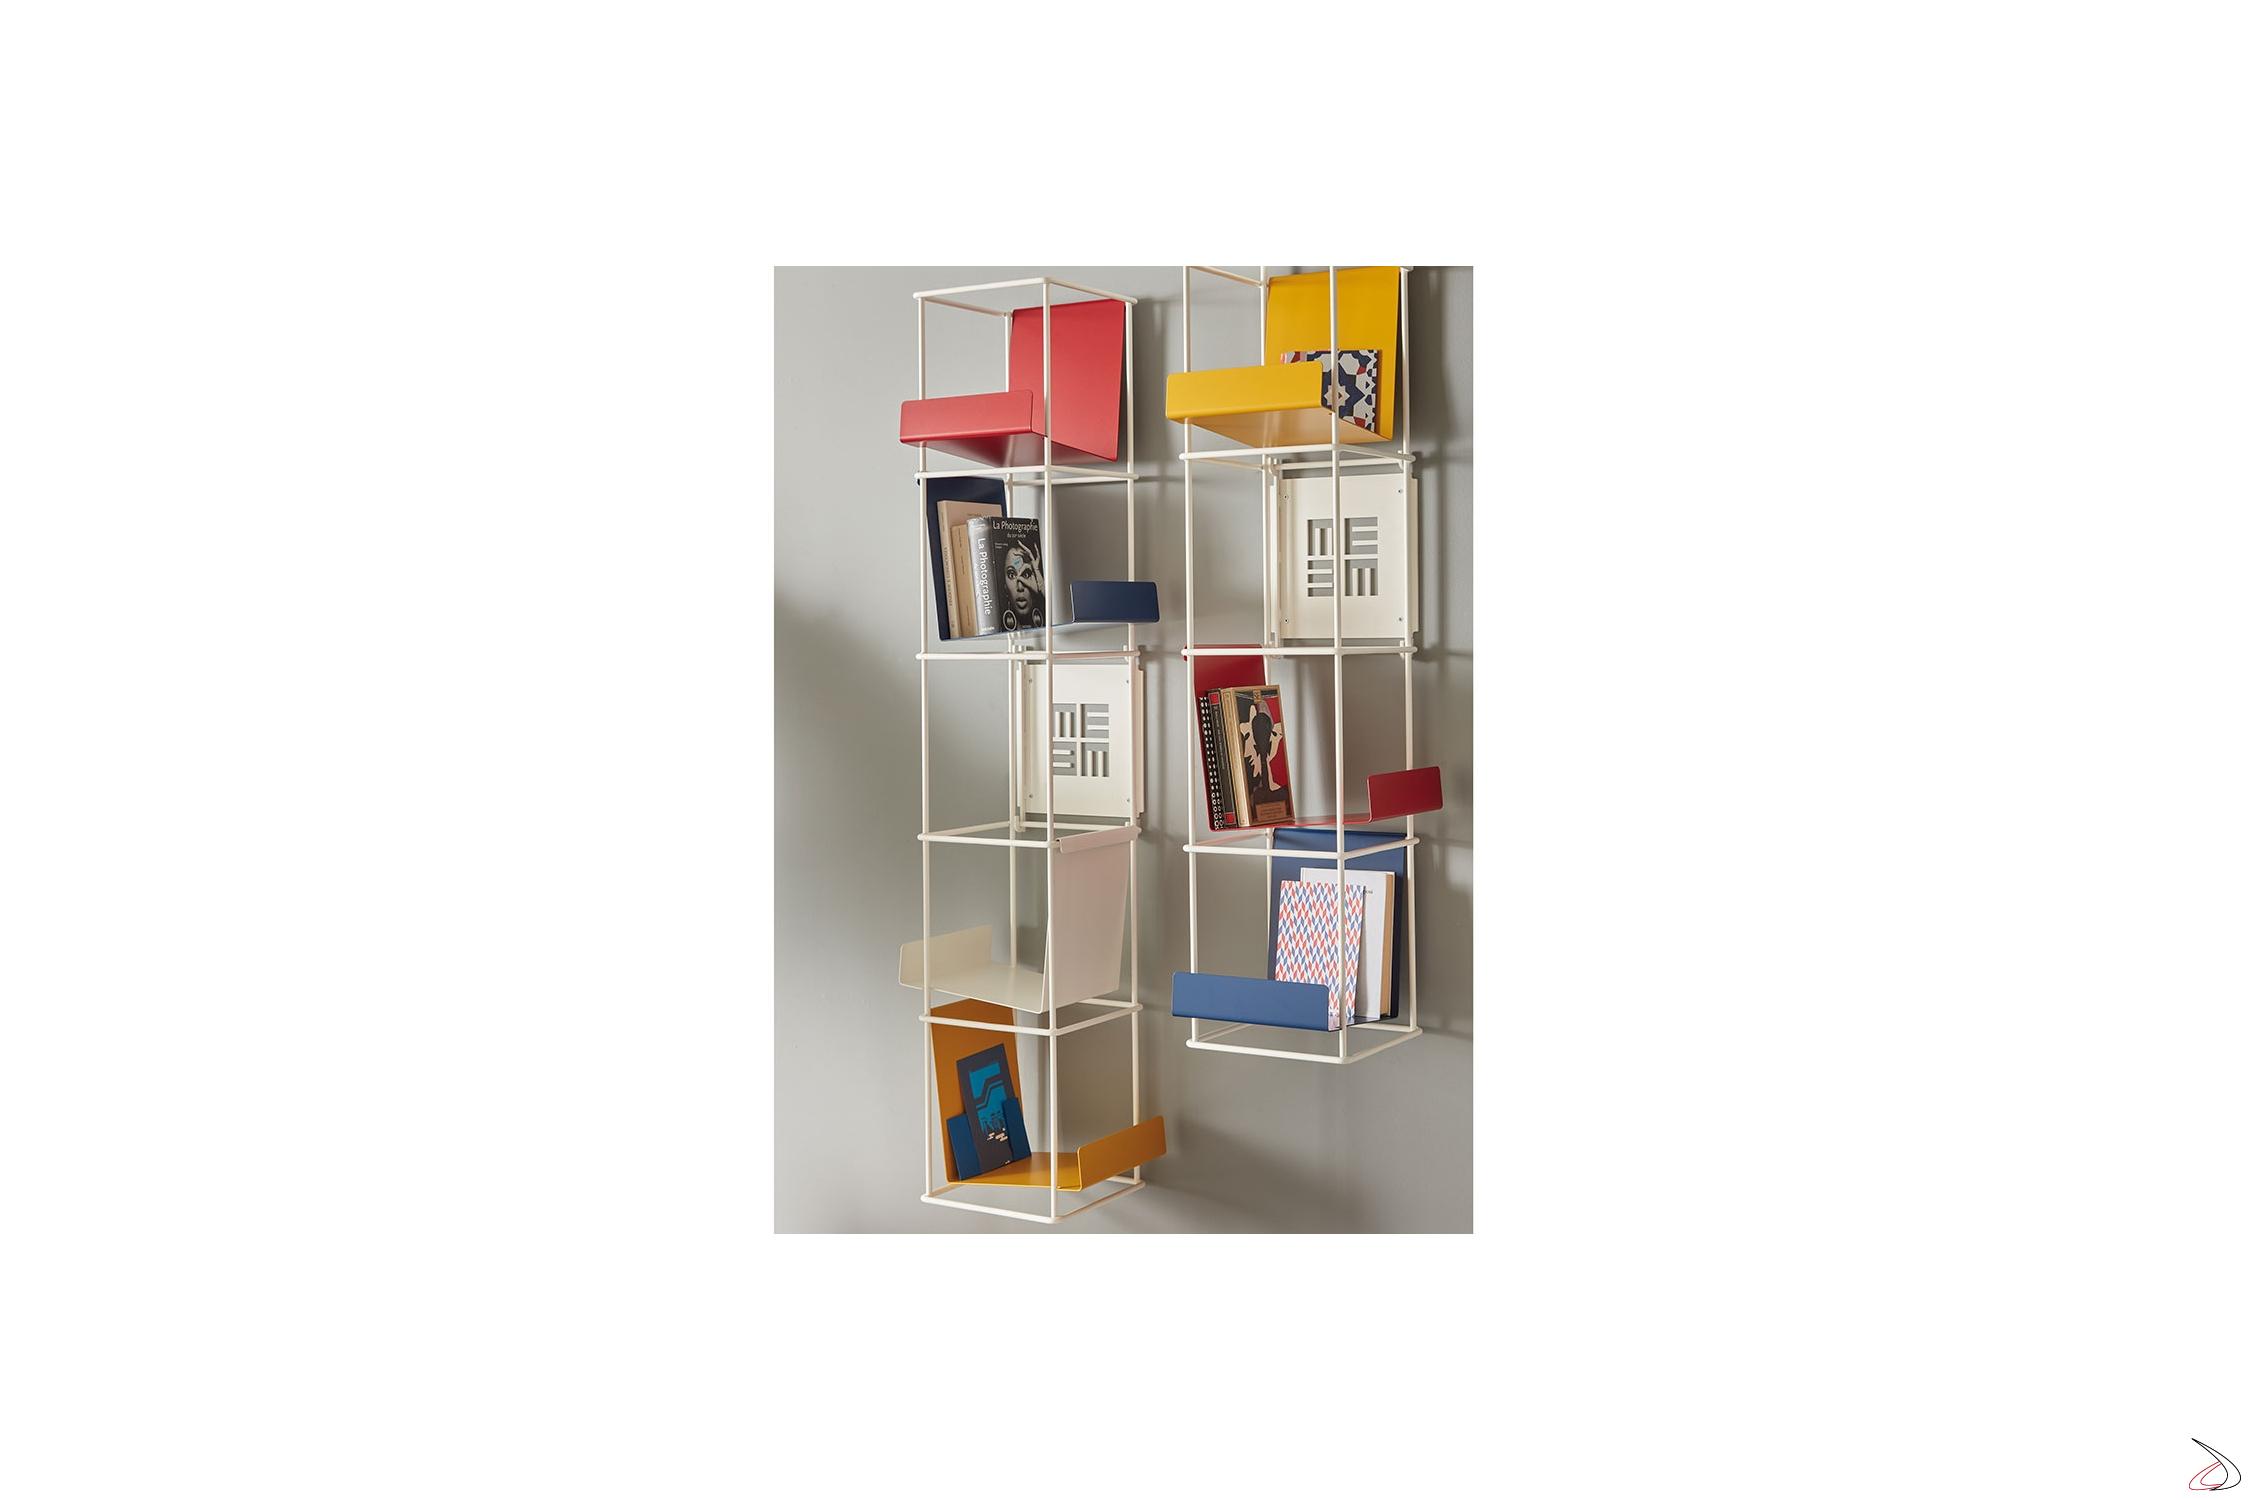 Libreria Verticale In Metallo.Libreria Verticale In Metallo Bianco Libro Verticale Toparredi